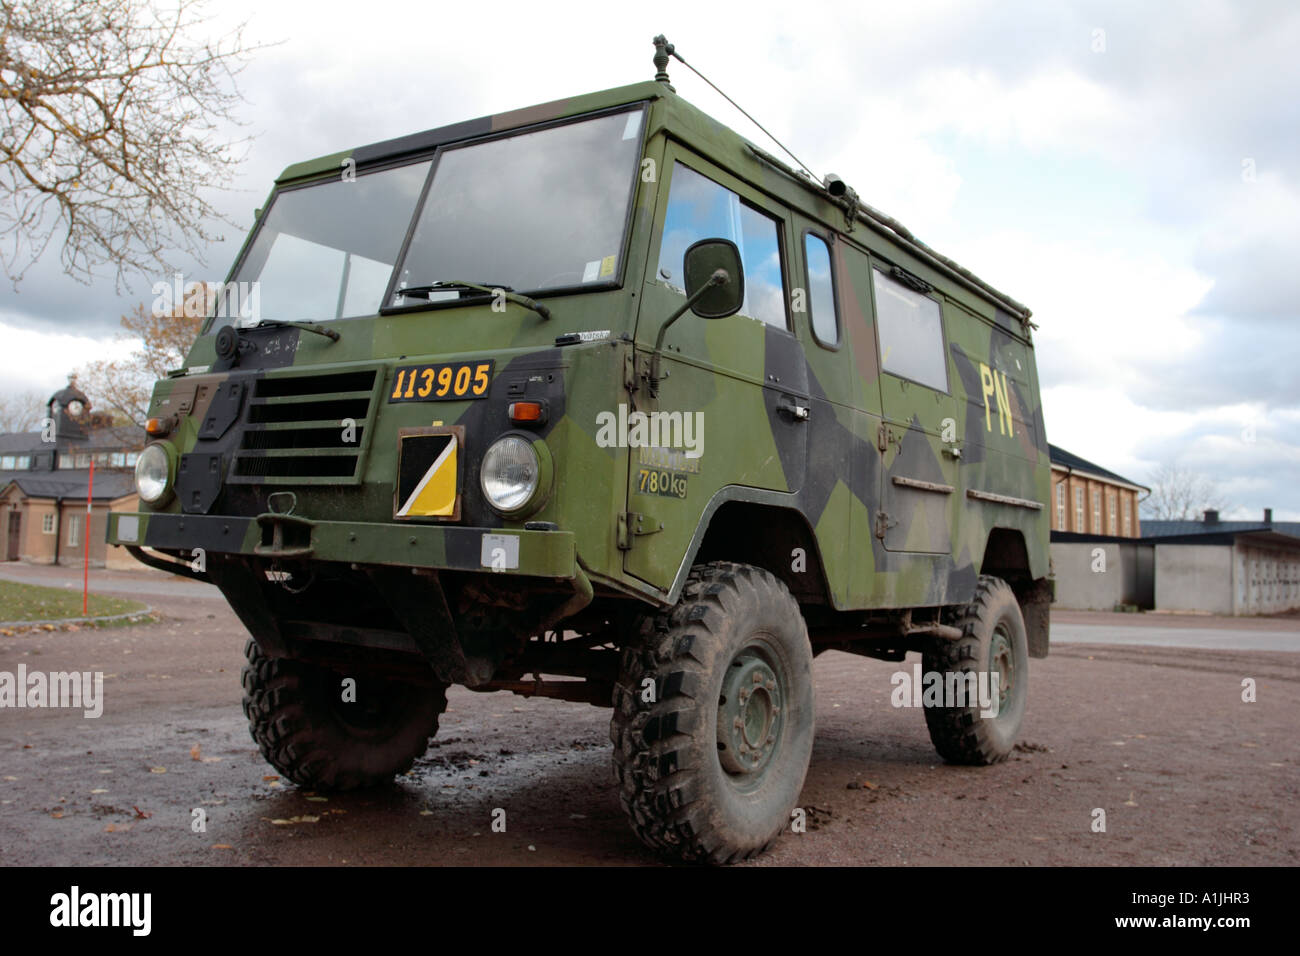 schwedische milit r jeep stockfoto bild 5870386 alamy. Black Bedroom Furniture Sets. Home Design Ideas